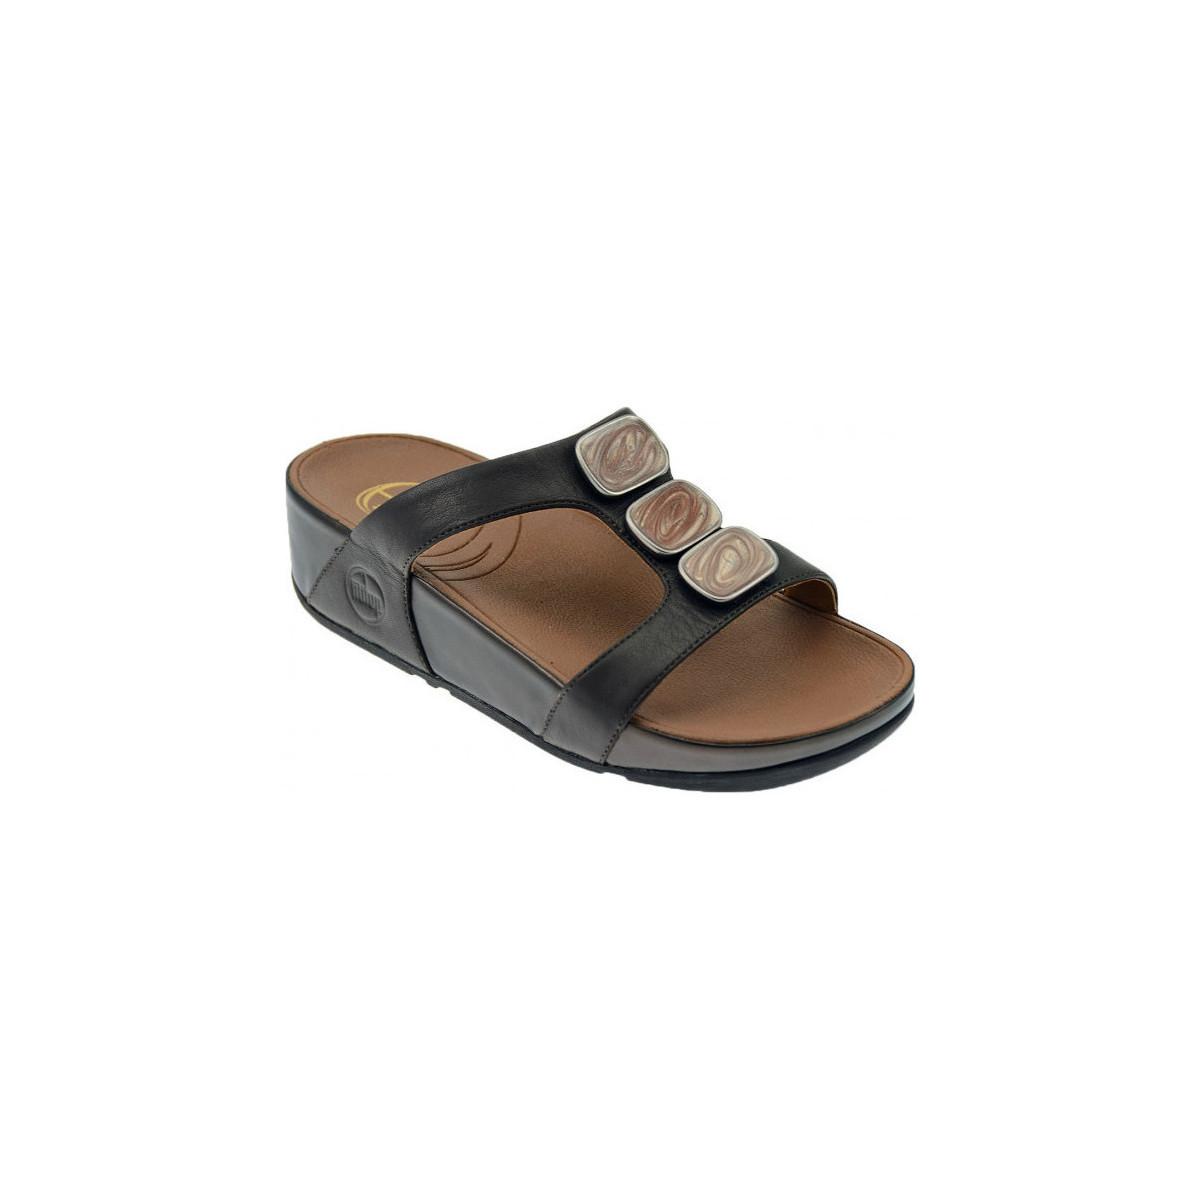 fitflop pietra due slide ciabatta fascia sandale schuhe sandalen sandaletten damen 99 00. Black Bedroom Furniture Sets. Home Design Ideas